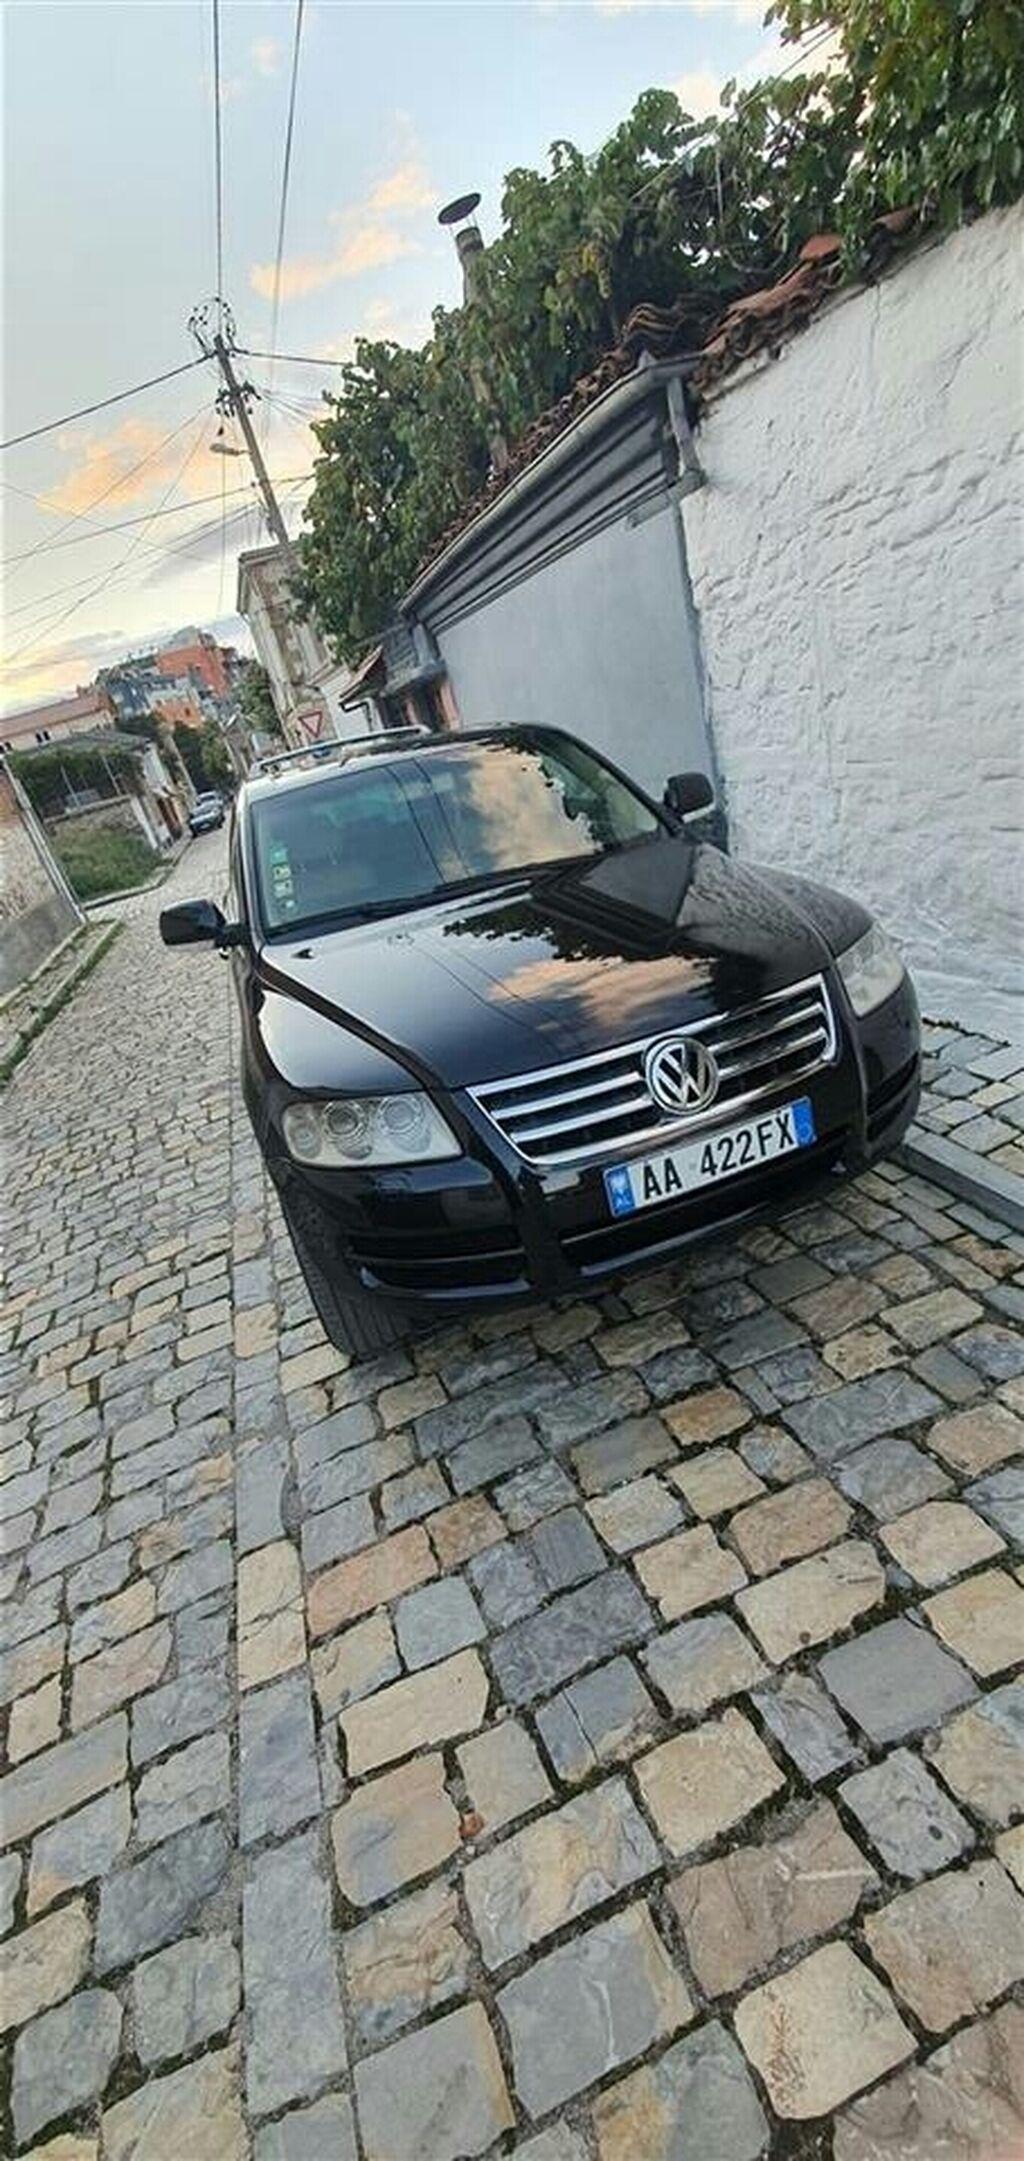 Volkswagen Touareg 2.5 l. 2005 | 211000 km | η αγγελία δημοσιεύτηκε 18 Ιούλιος 2021 19:01:16: Volkswagen Touareg 2.5 l. 2005 | 211000 km